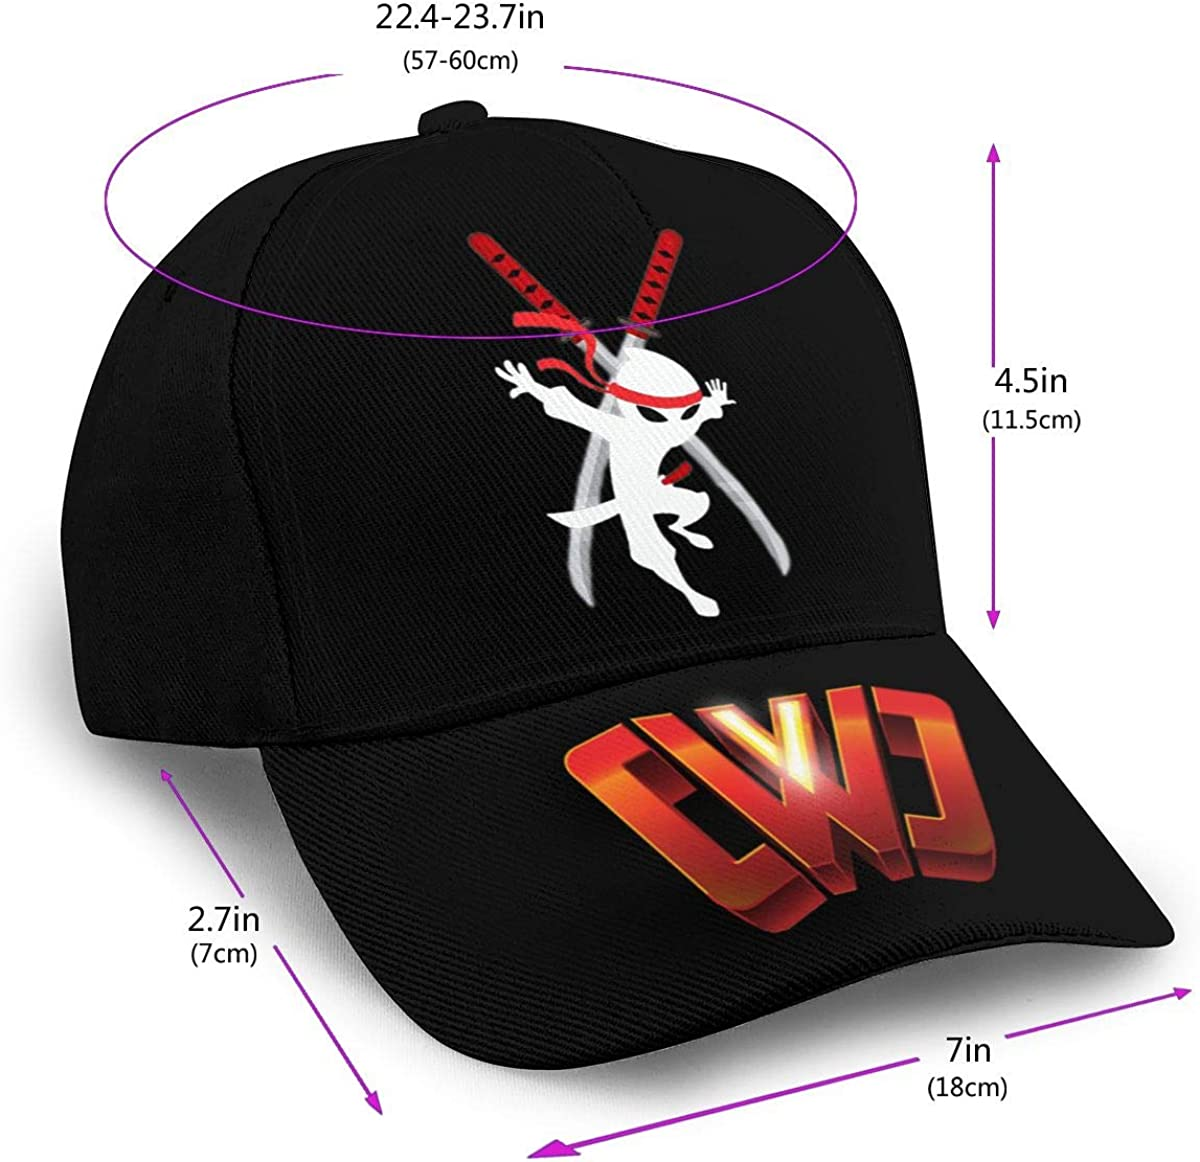 L/&B521/_Caps Unisex 3D Print Hat Z0rg0/_C/_W/_C Baseball Cap Hip Hop Snapback Adjustable Flat Bill Hat for Men Women